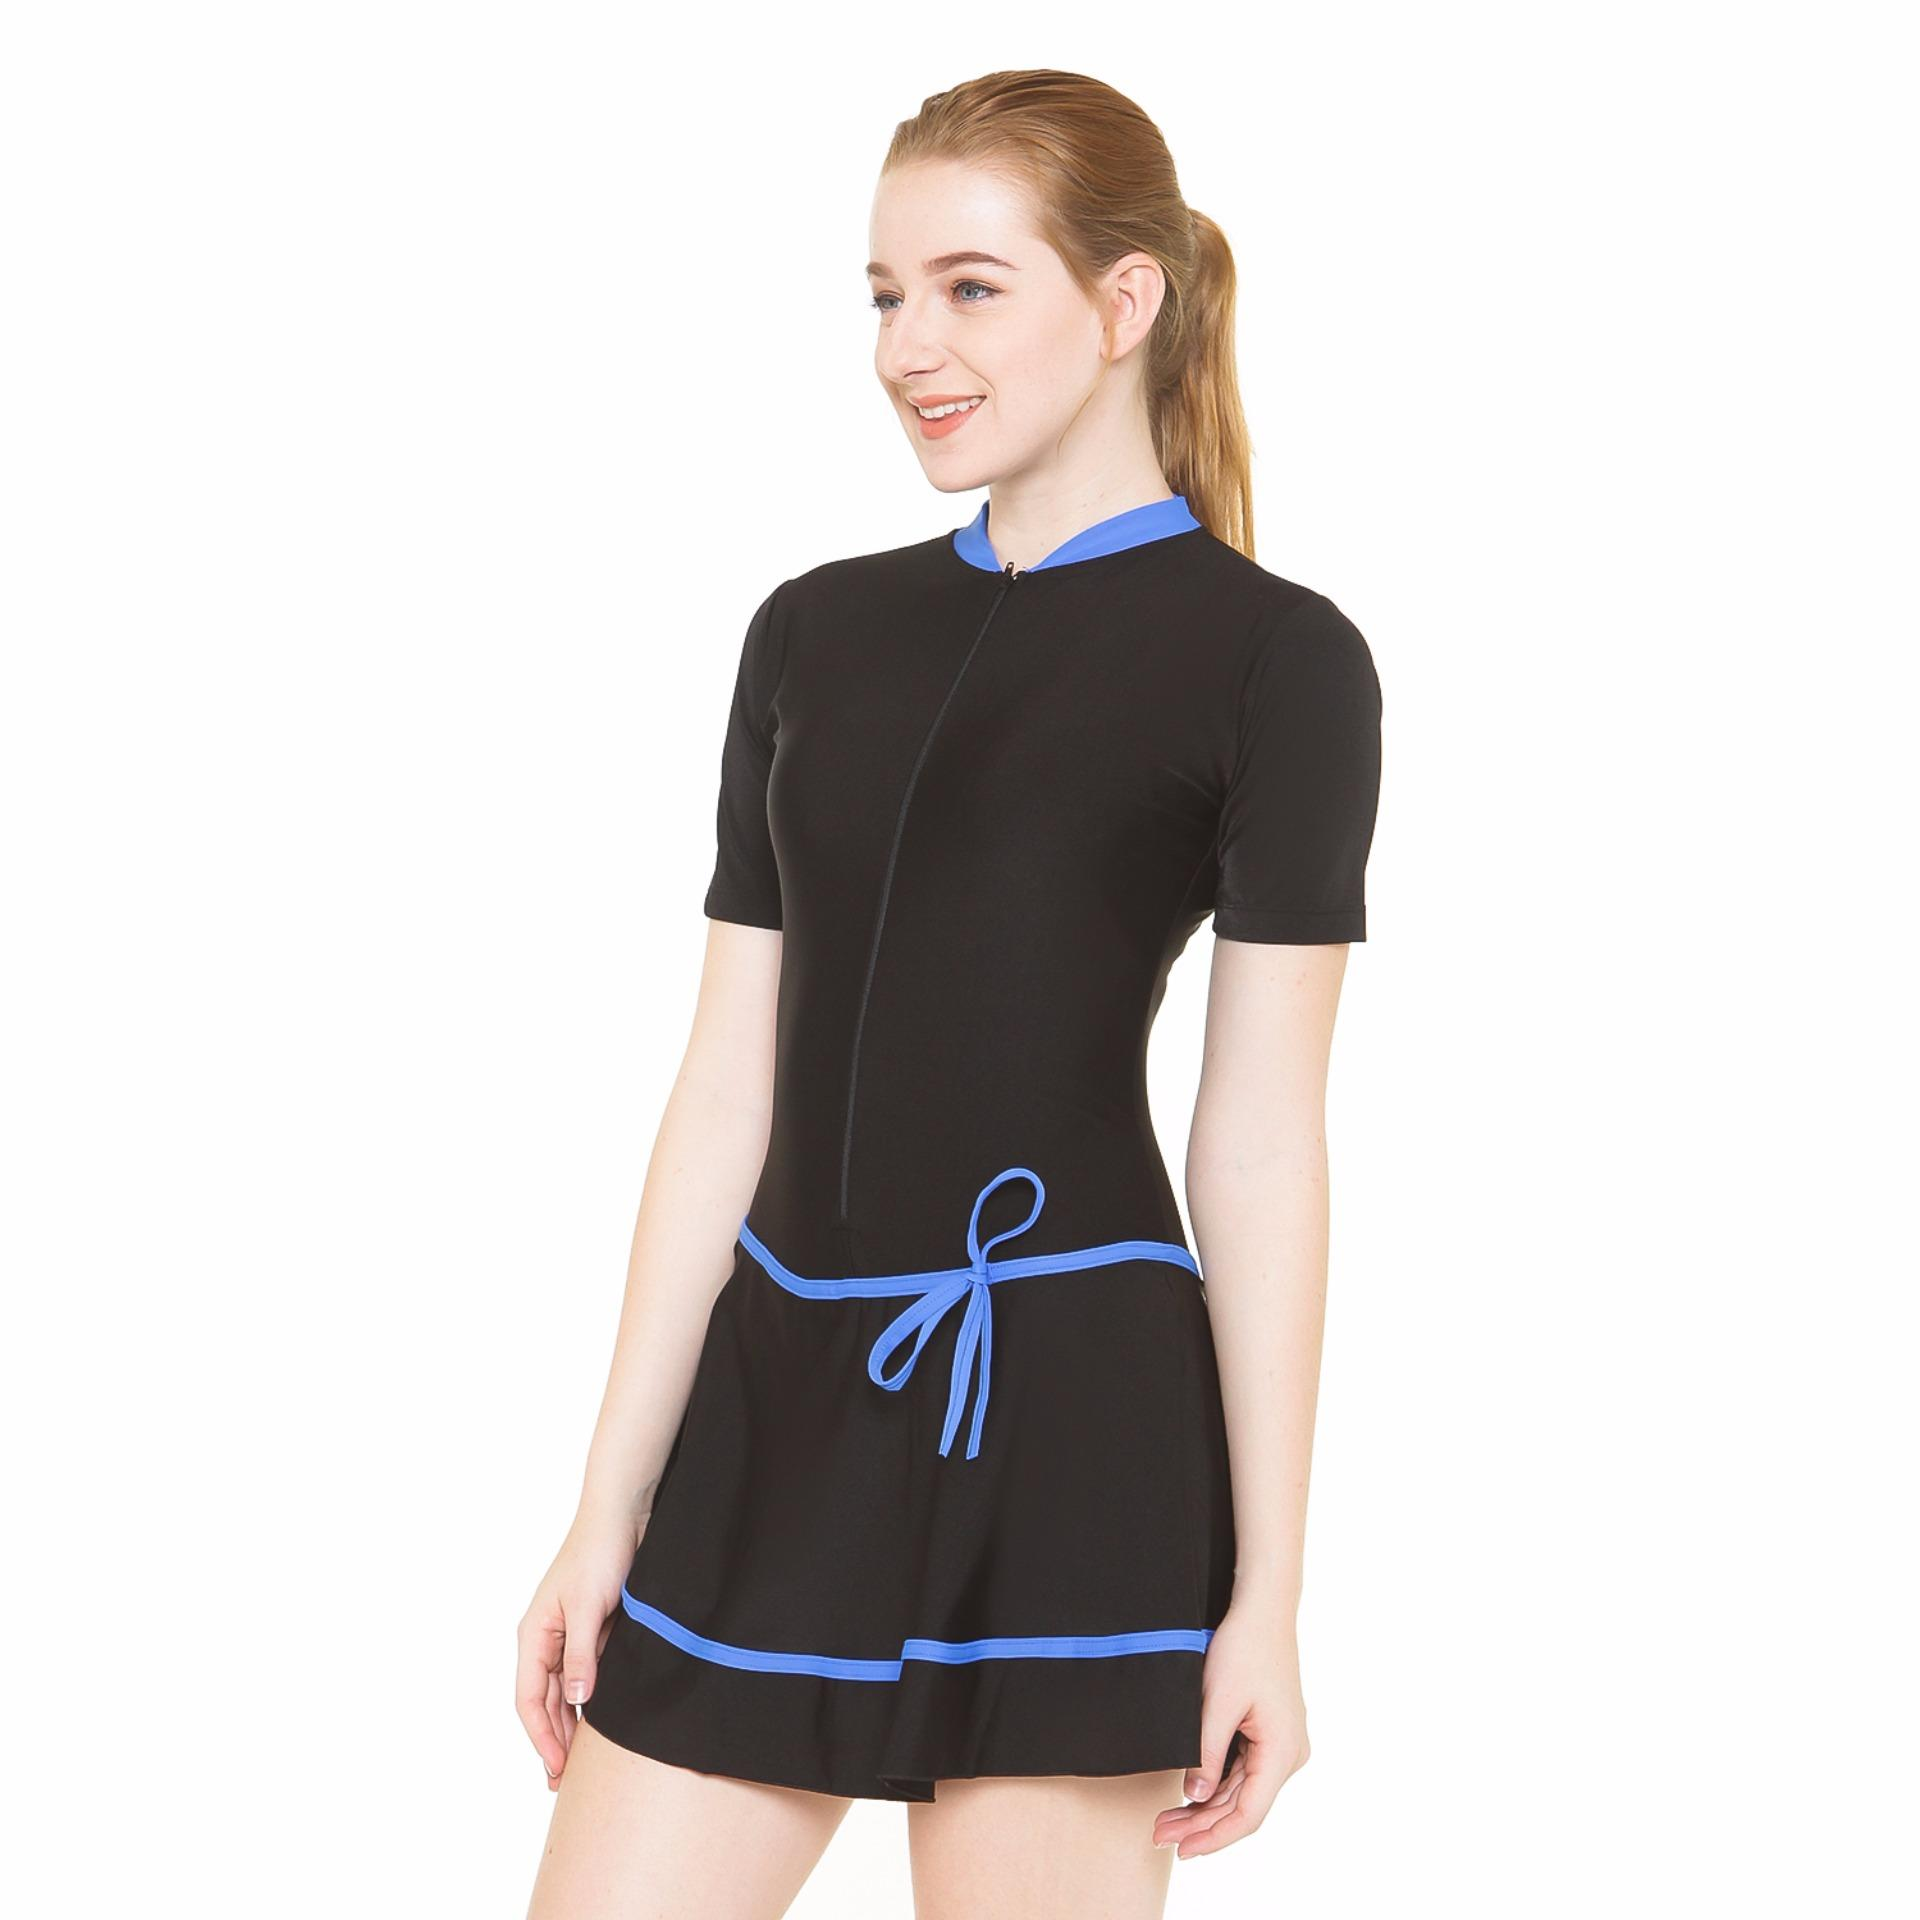 Baju Renang Wanita-HDR-1106-Hitam .